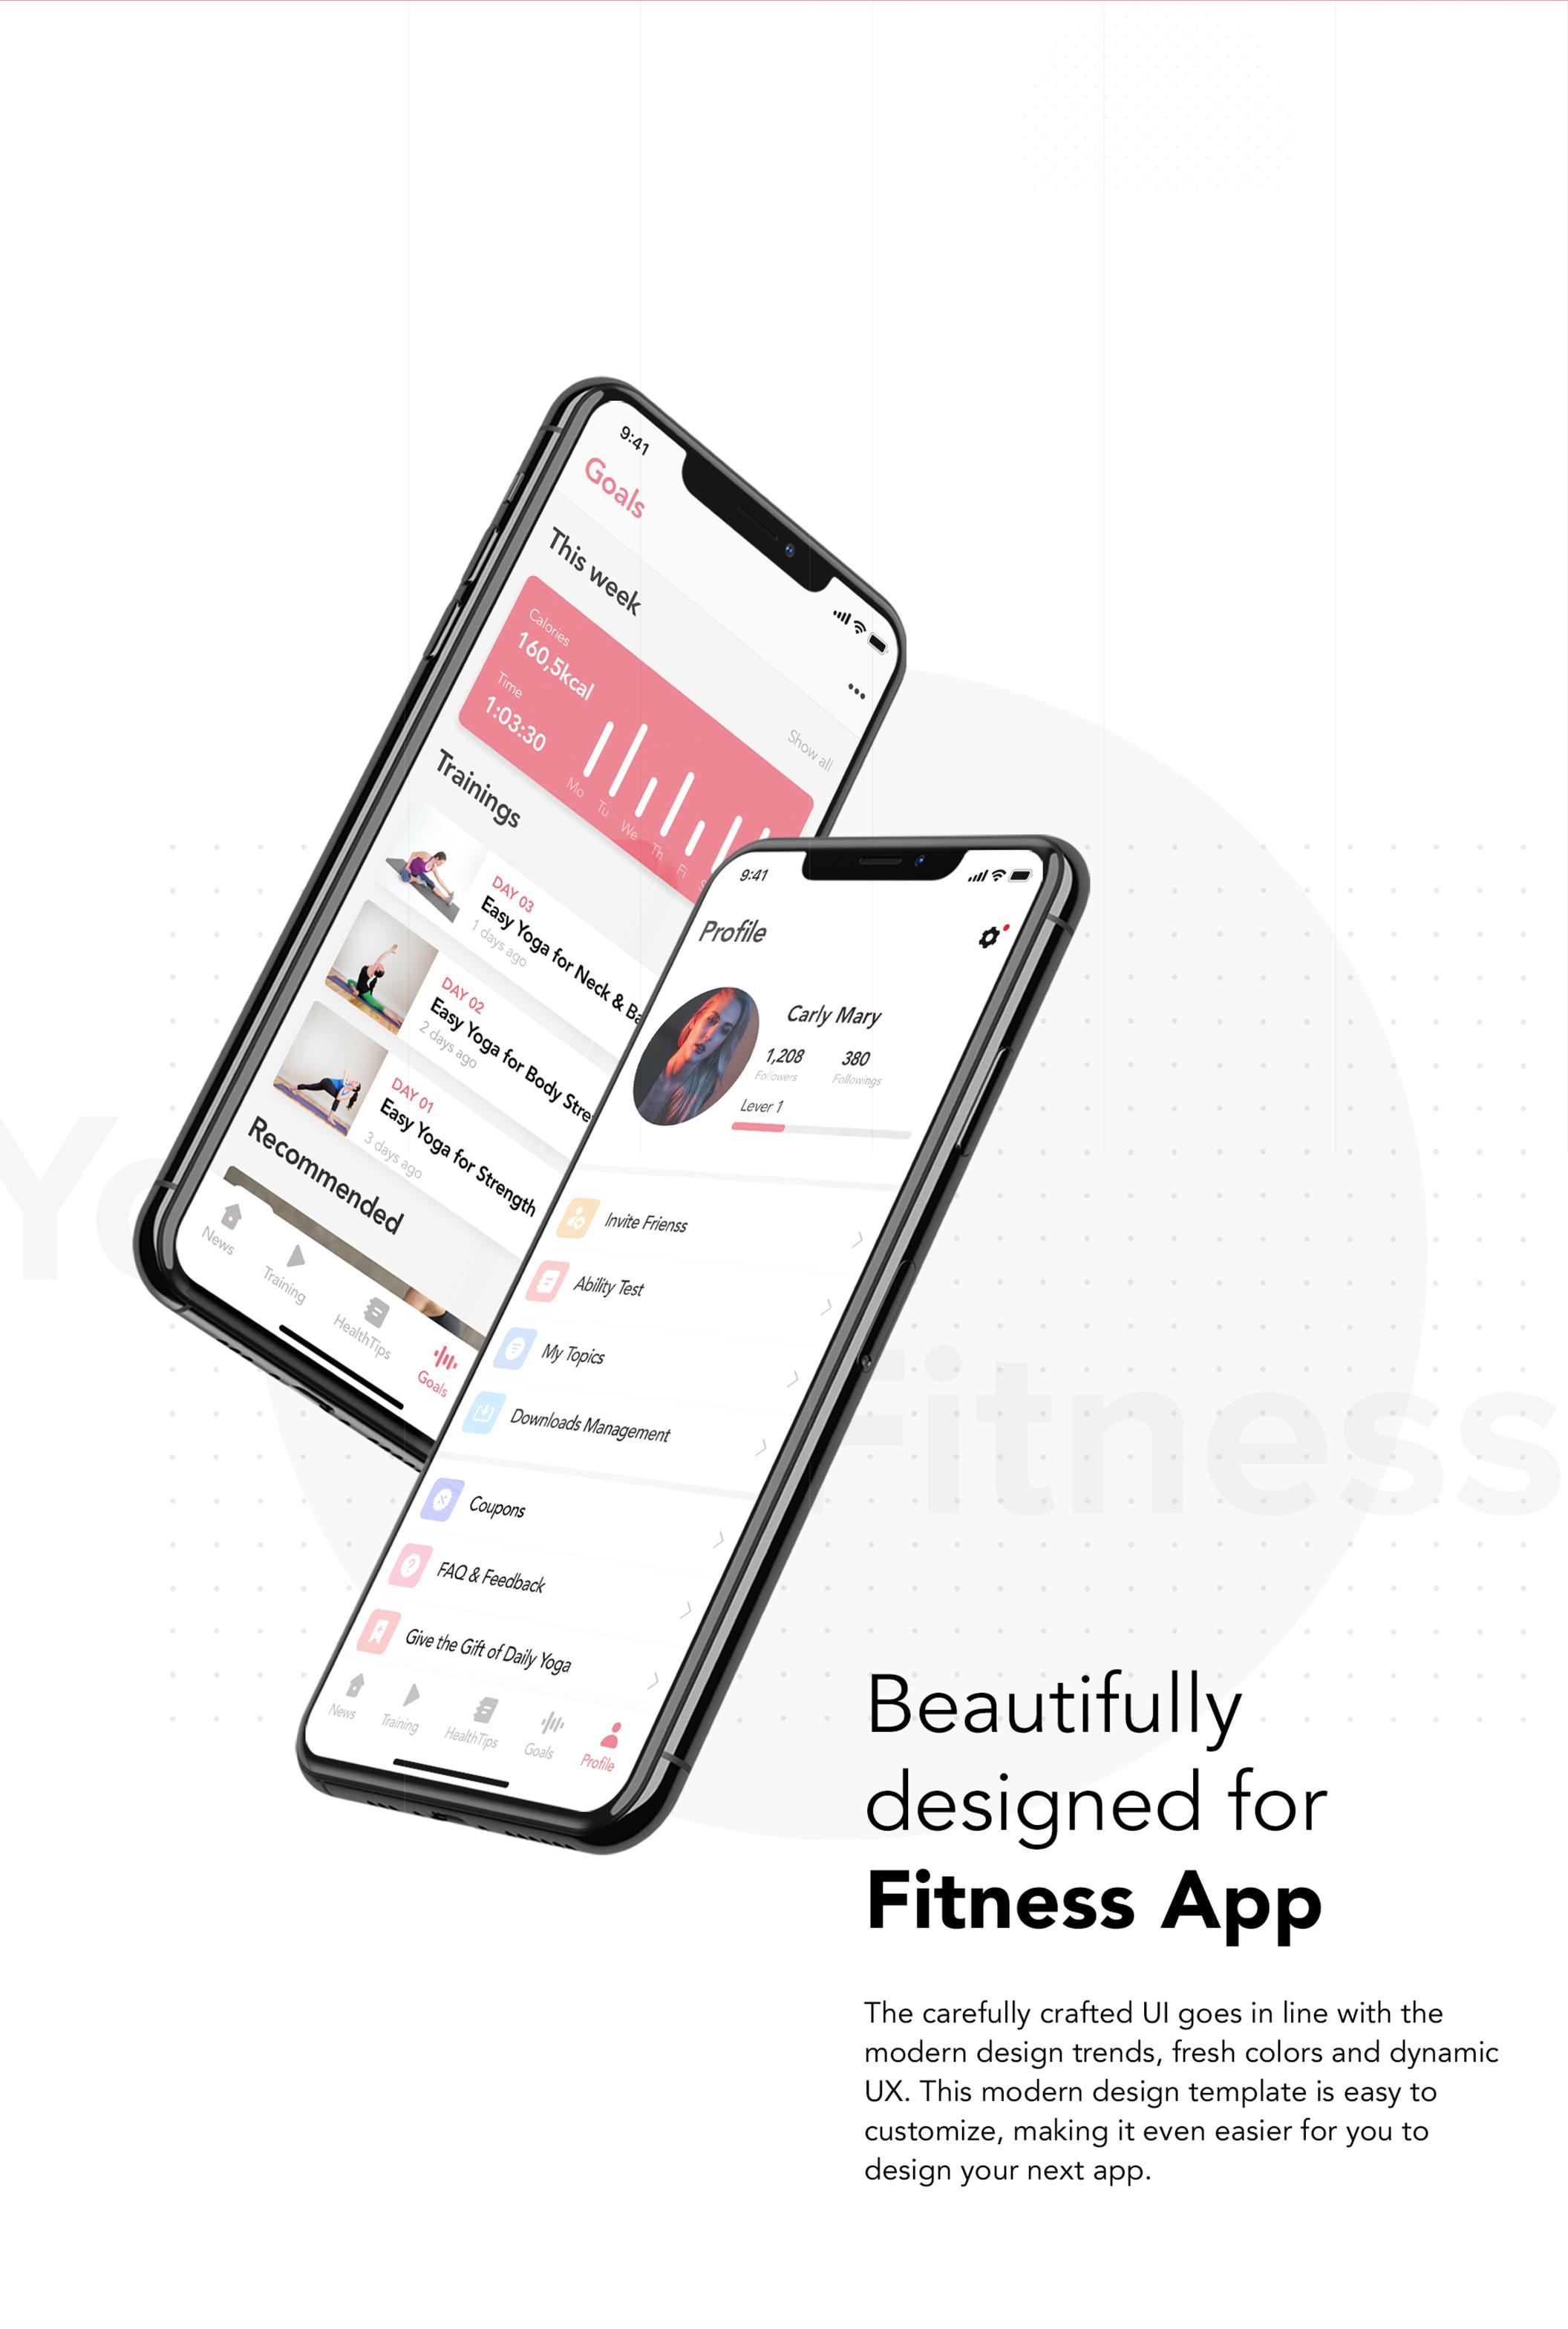 瑜伽健身应用程序APP界面设计UI套件 Yoga Fitness Mobile App UI Kit插图(3)